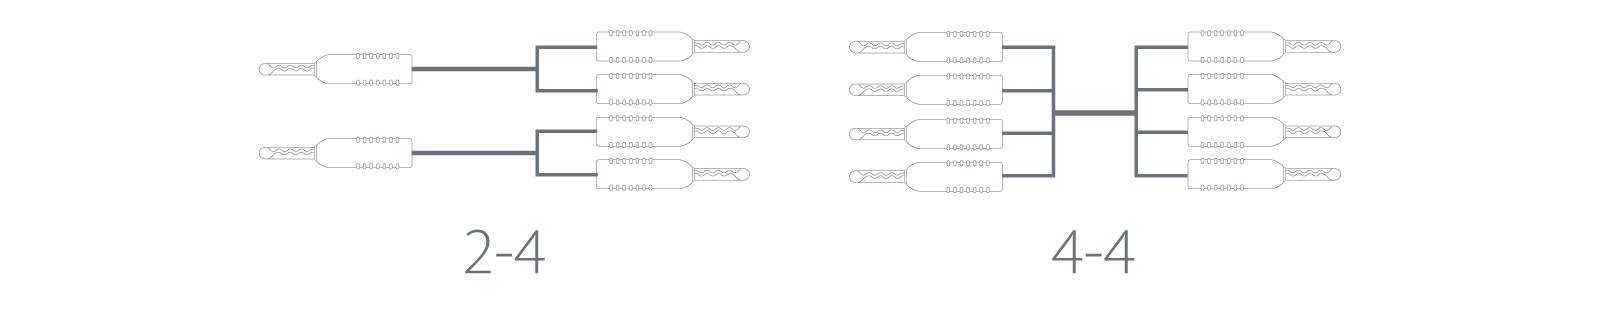 bi-wire configuration options